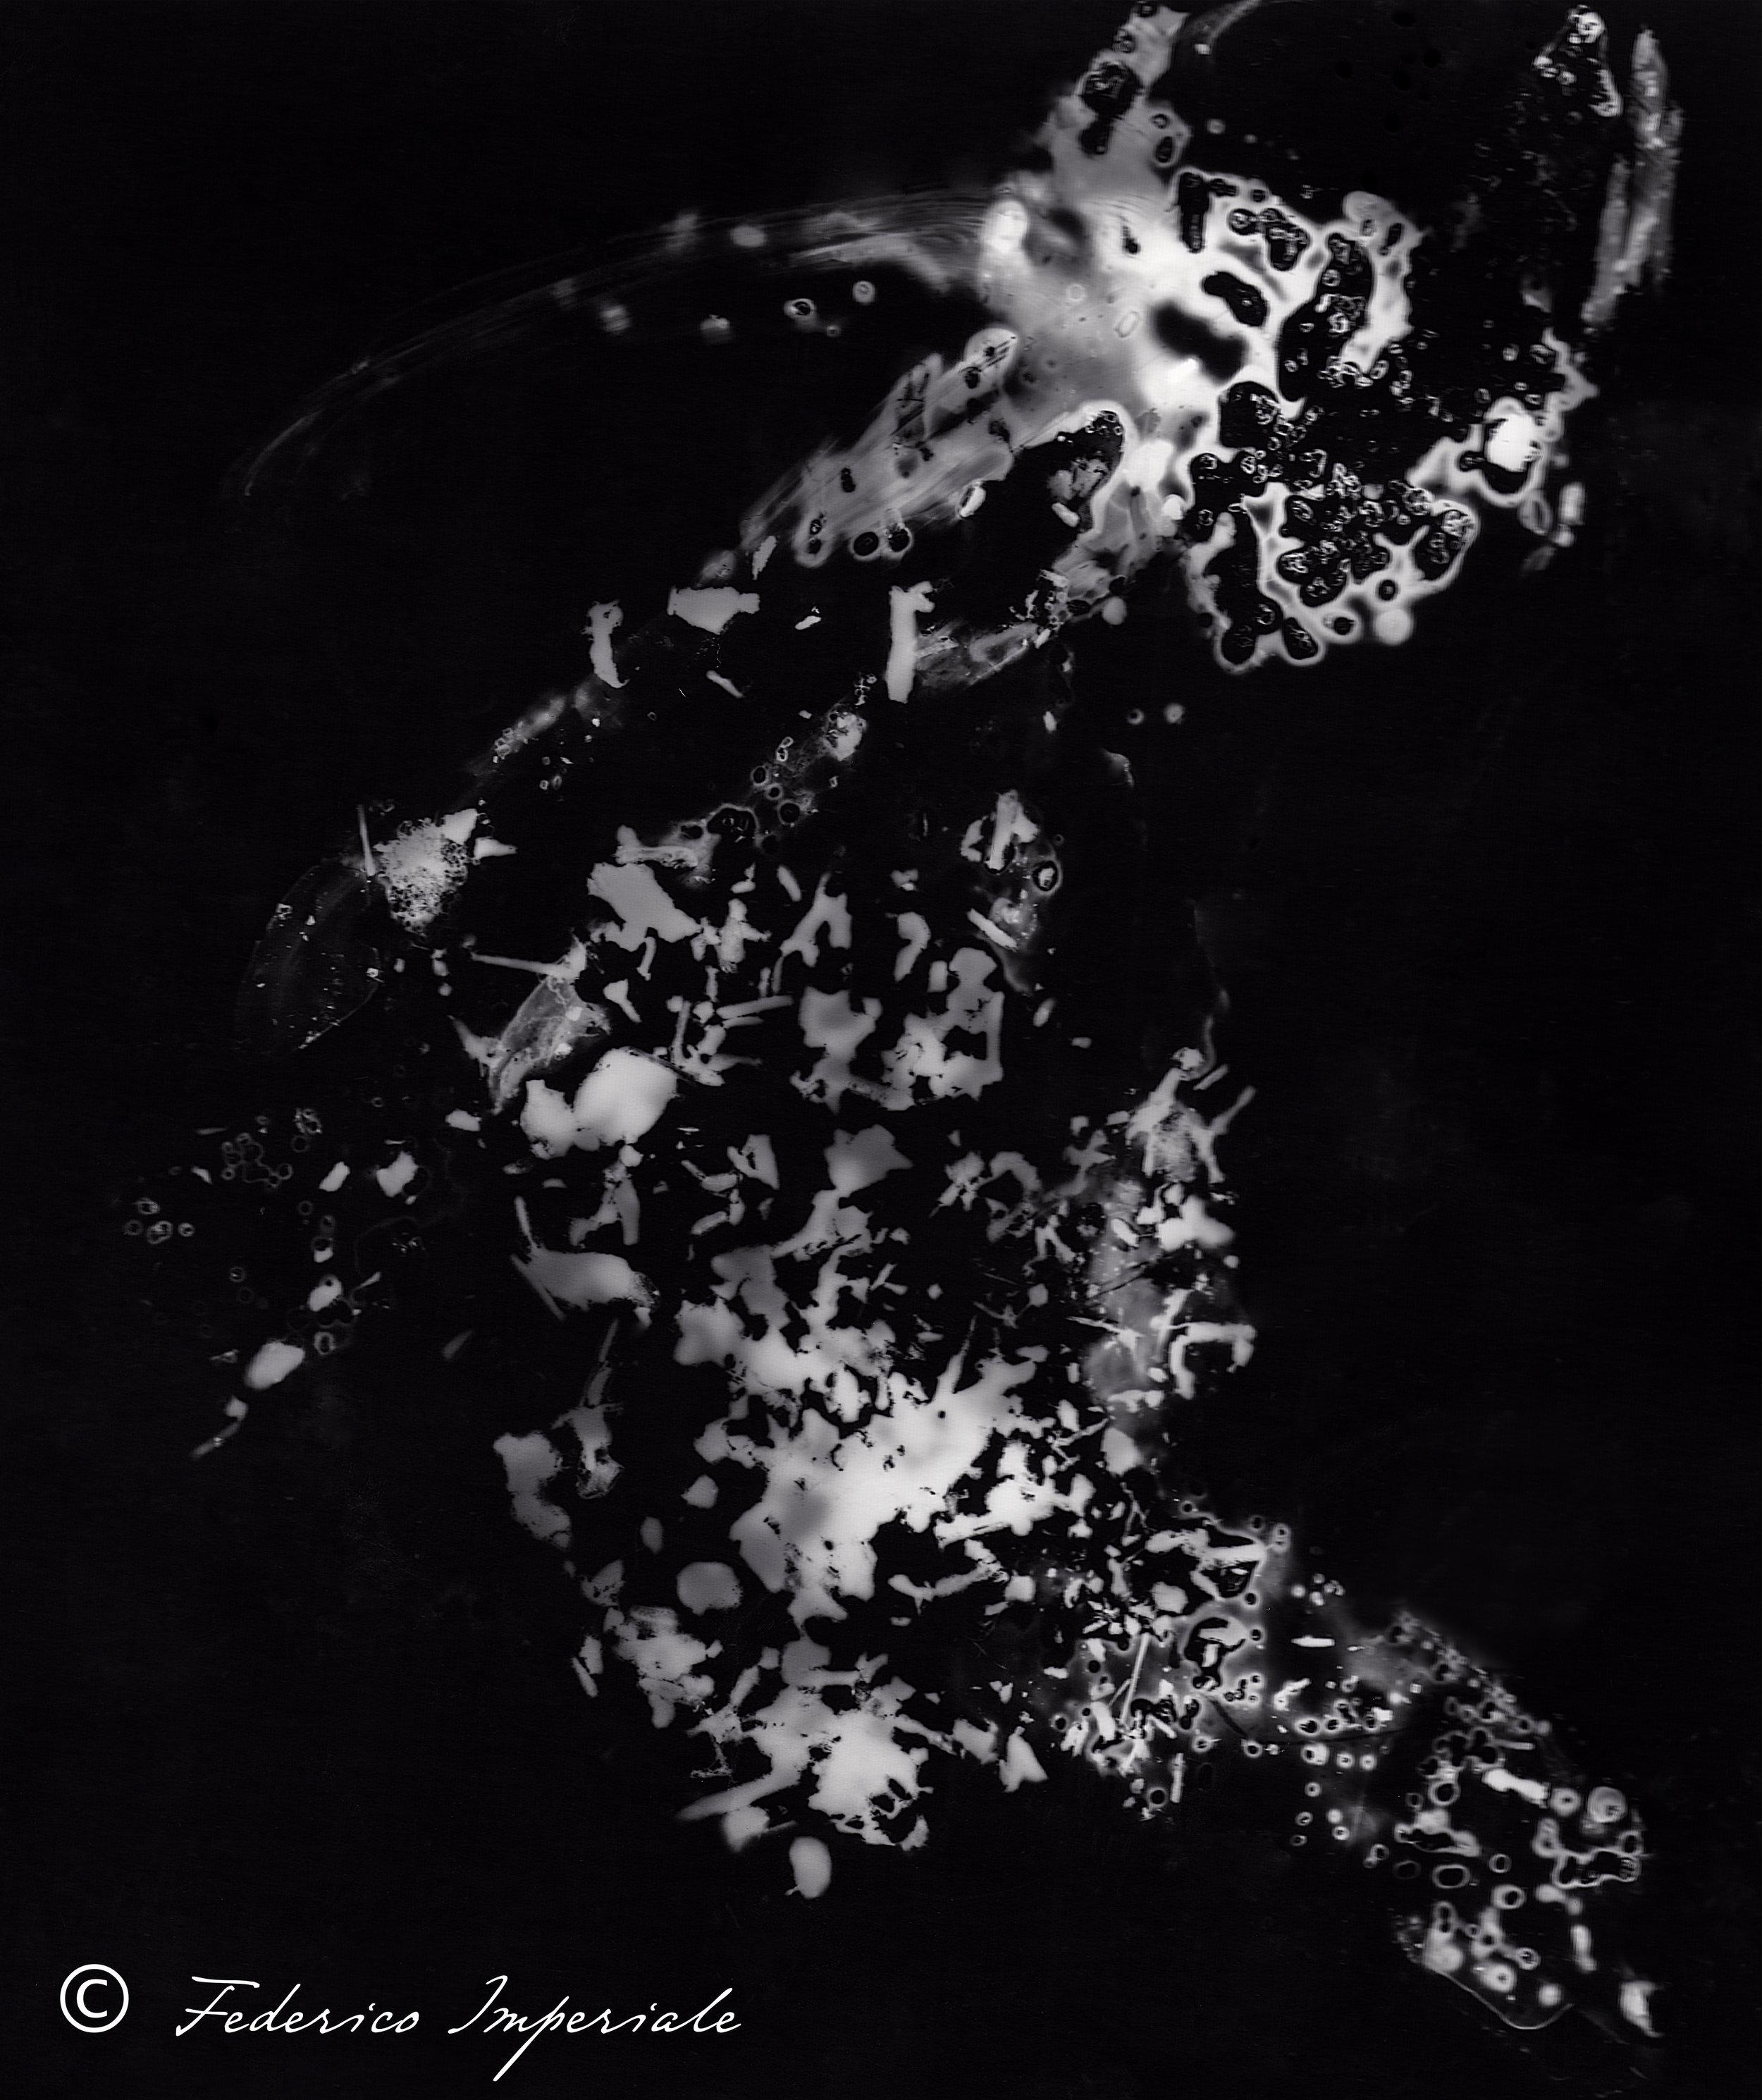 _Darkroom-2.jpg